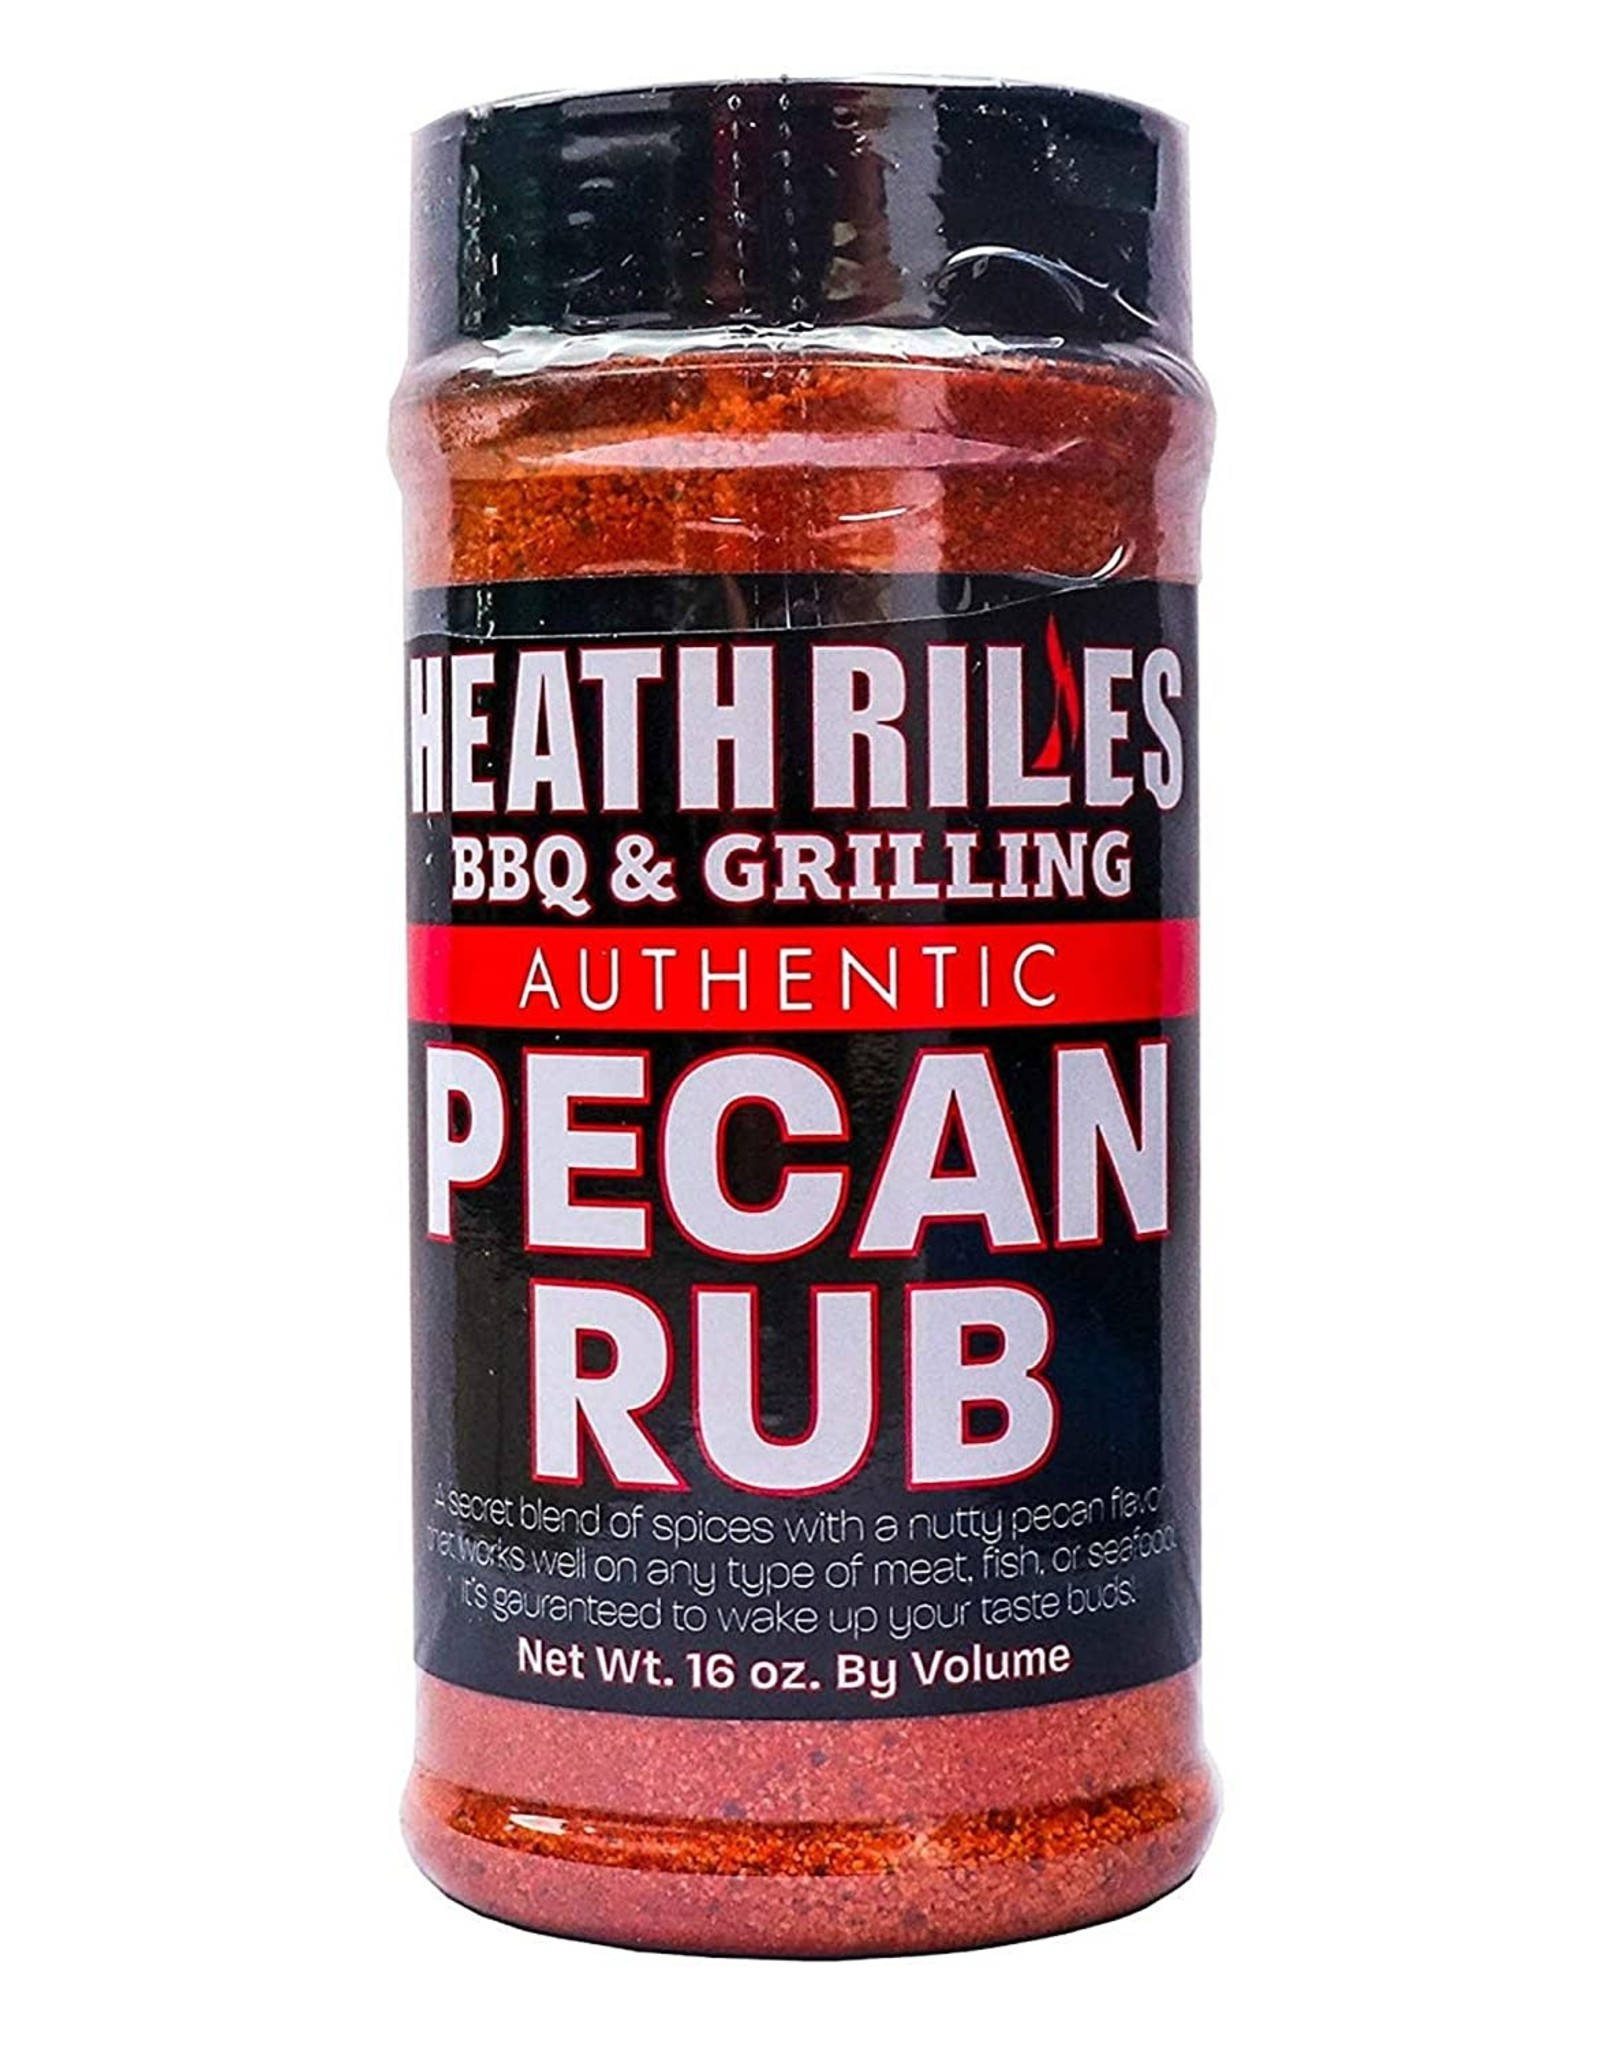 Heath Riles BBQ Heath Riles BBQ - Pecan Rub Shaker, 16 oz.